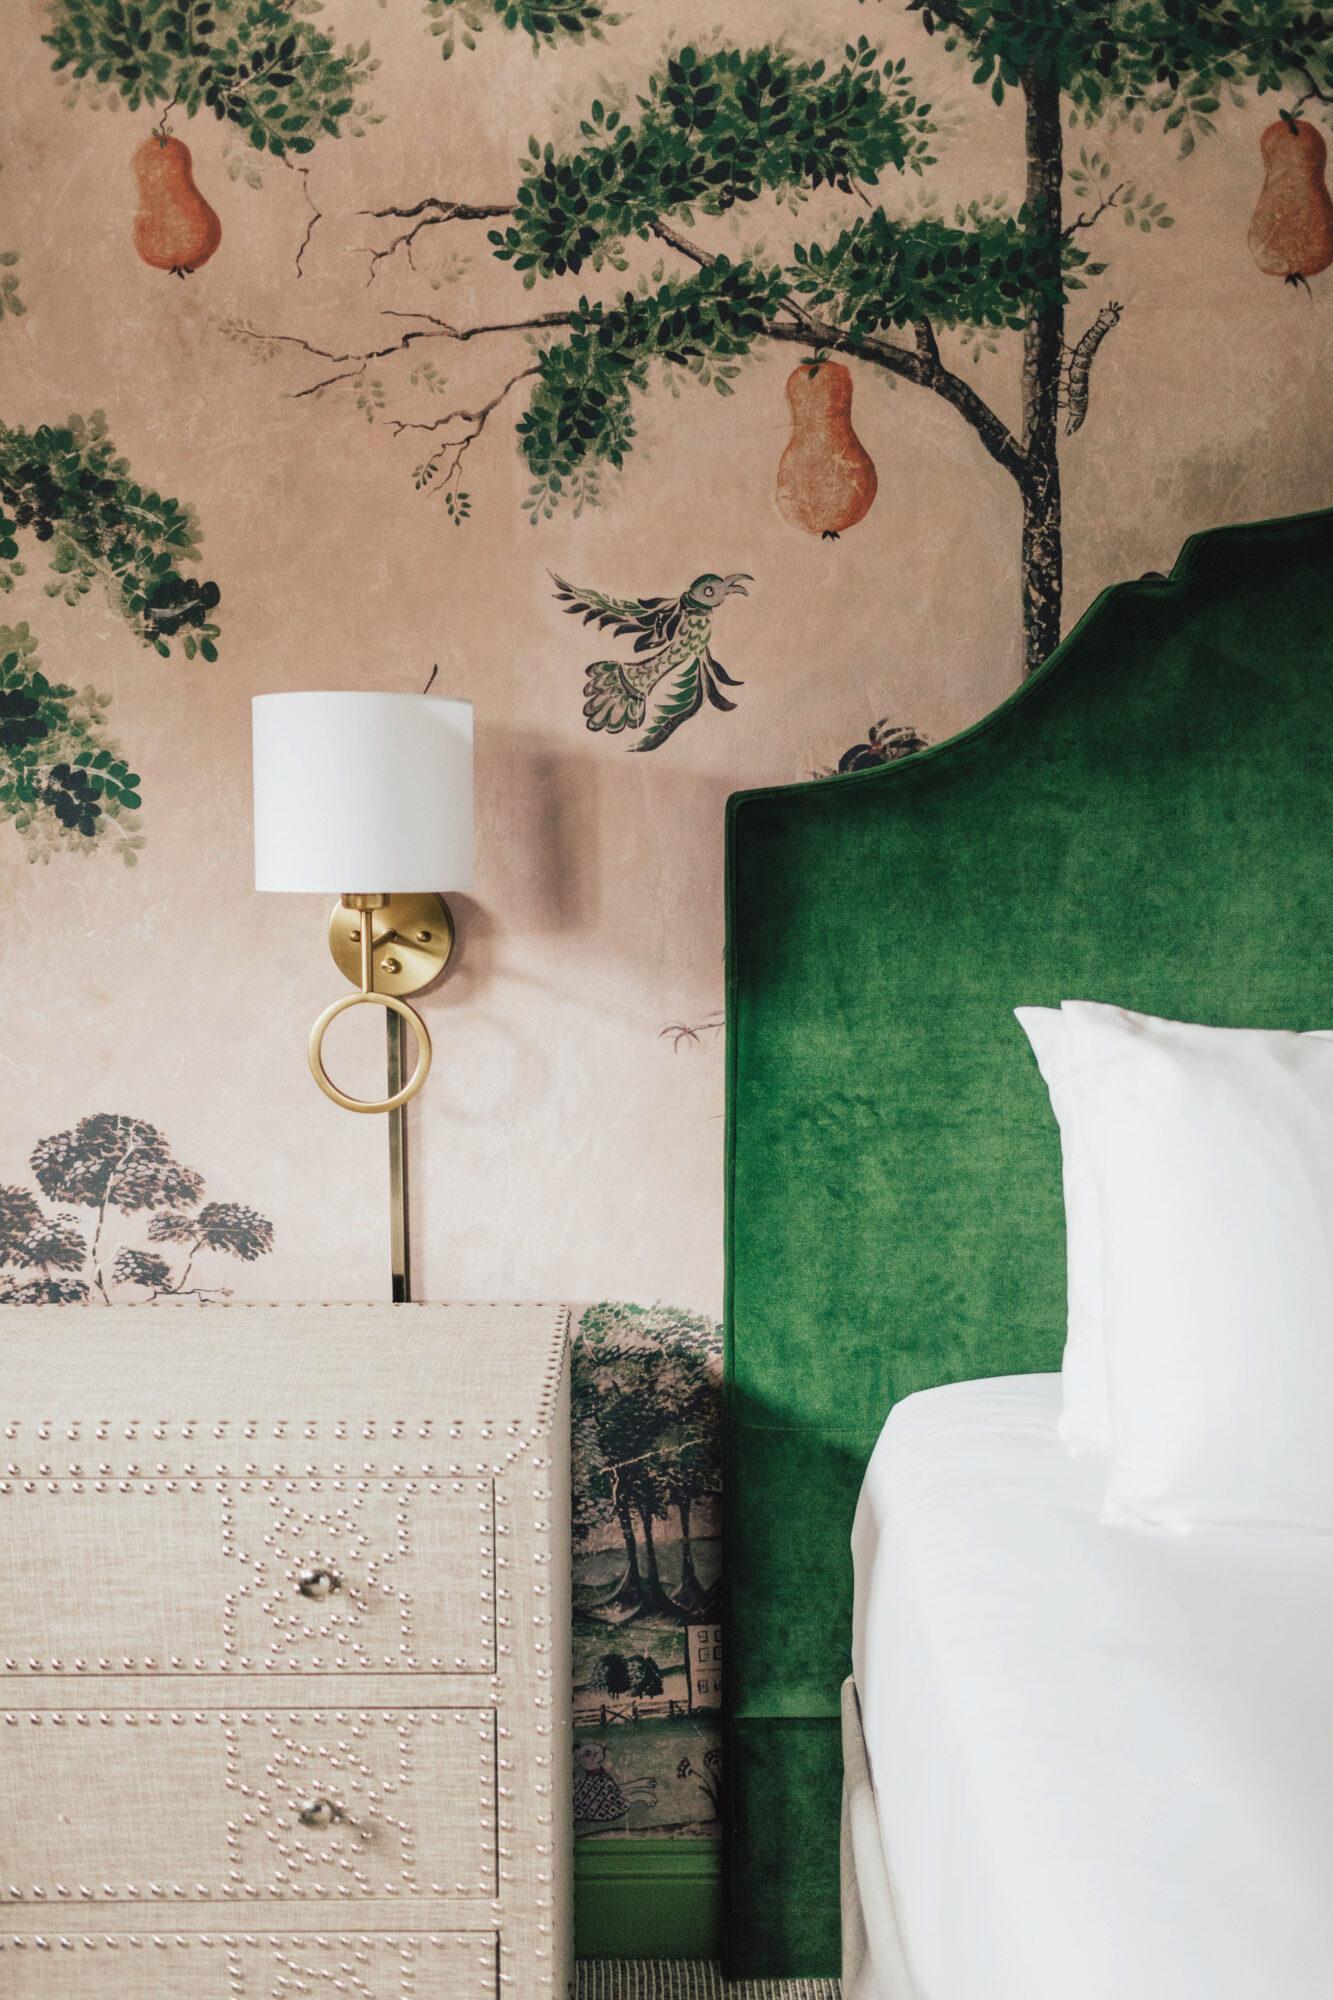 green headboard against botanical wallpaper